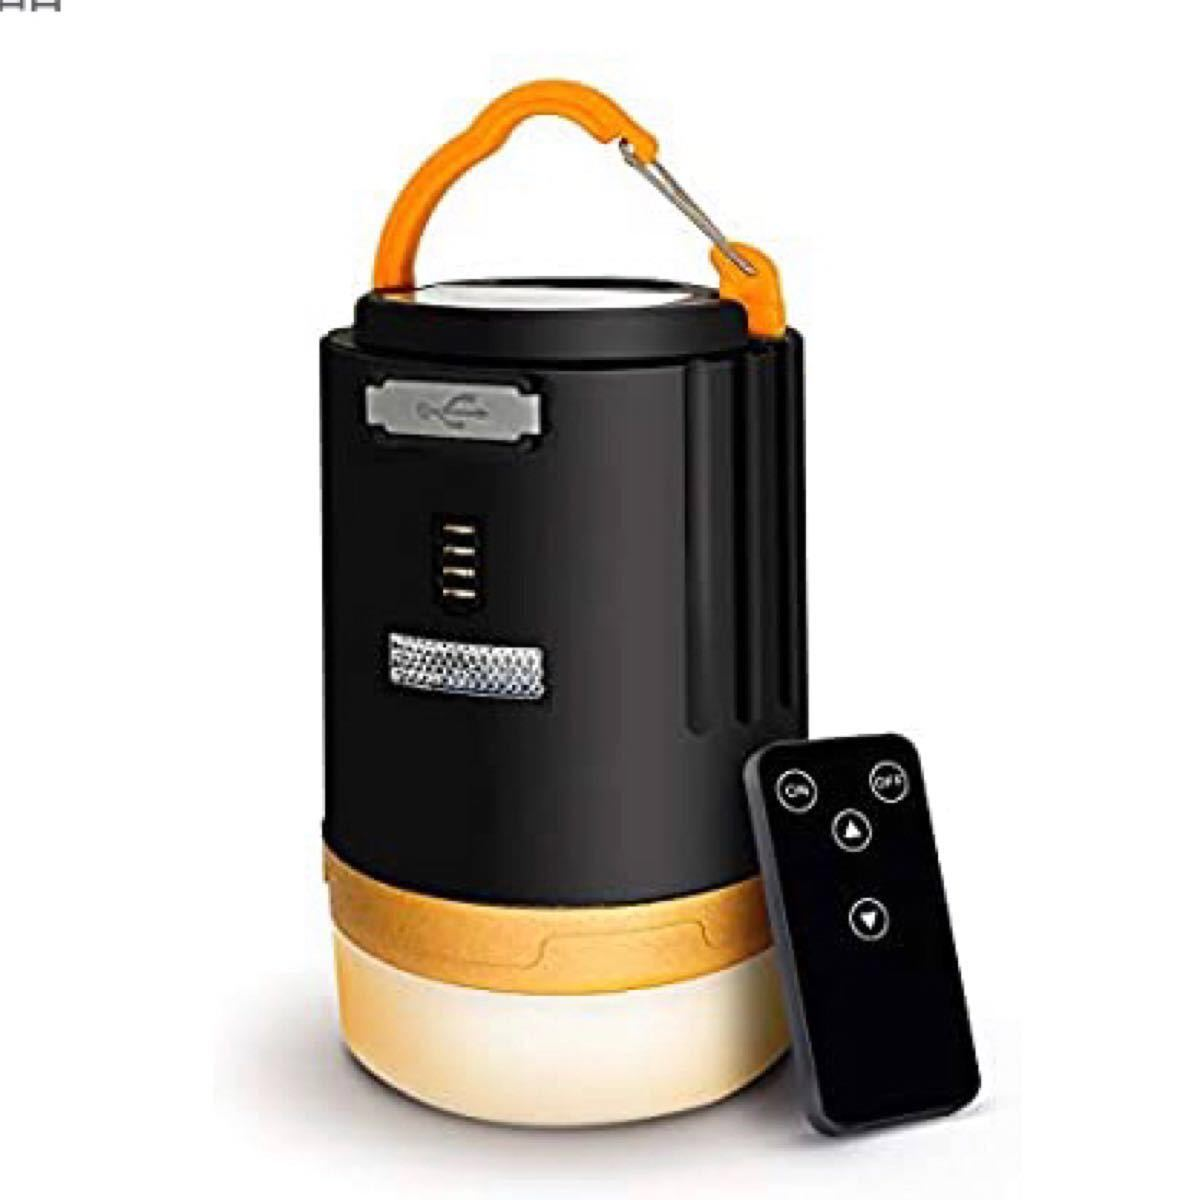 LEDランタン キャンプランタン暖色 3段階調光 軽量 アウトドア キャンプ 吊り下げ 防水 停電 車中泊 登山  停電防災用品